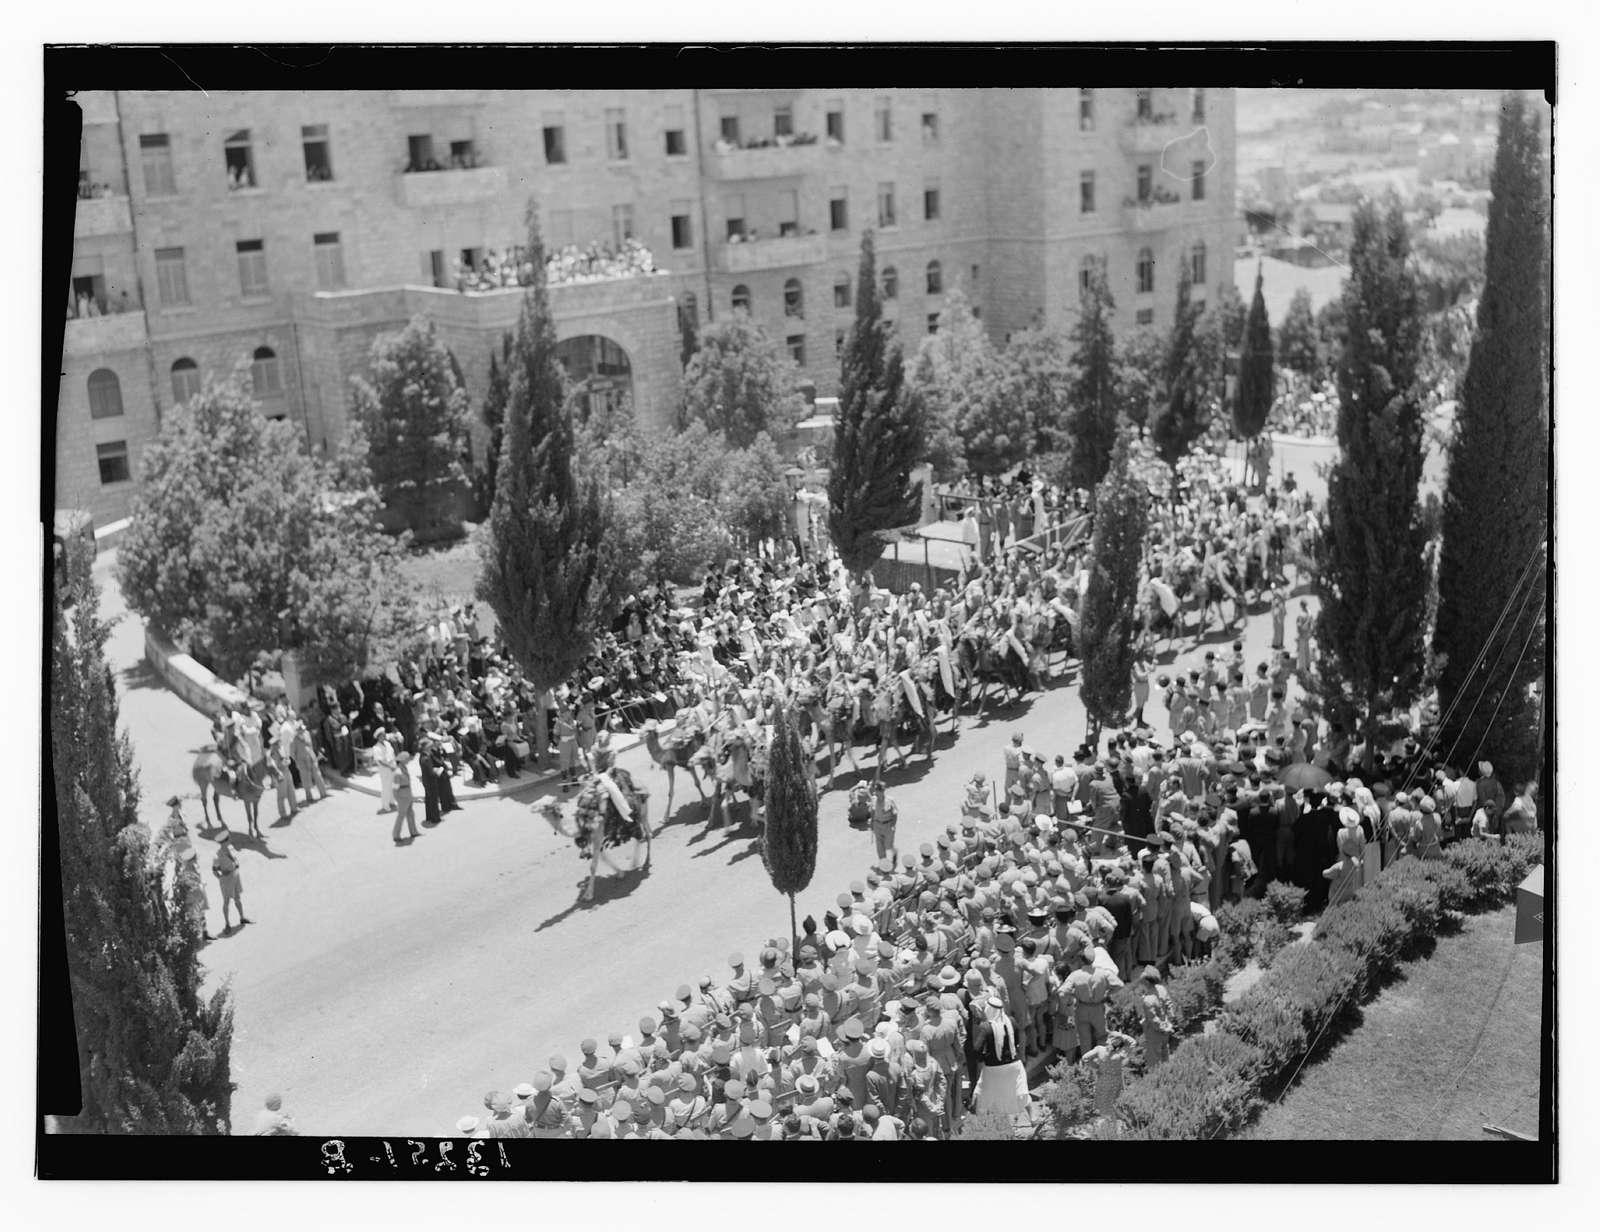 King George VI, birthday parade & presentations, June 14, 1945